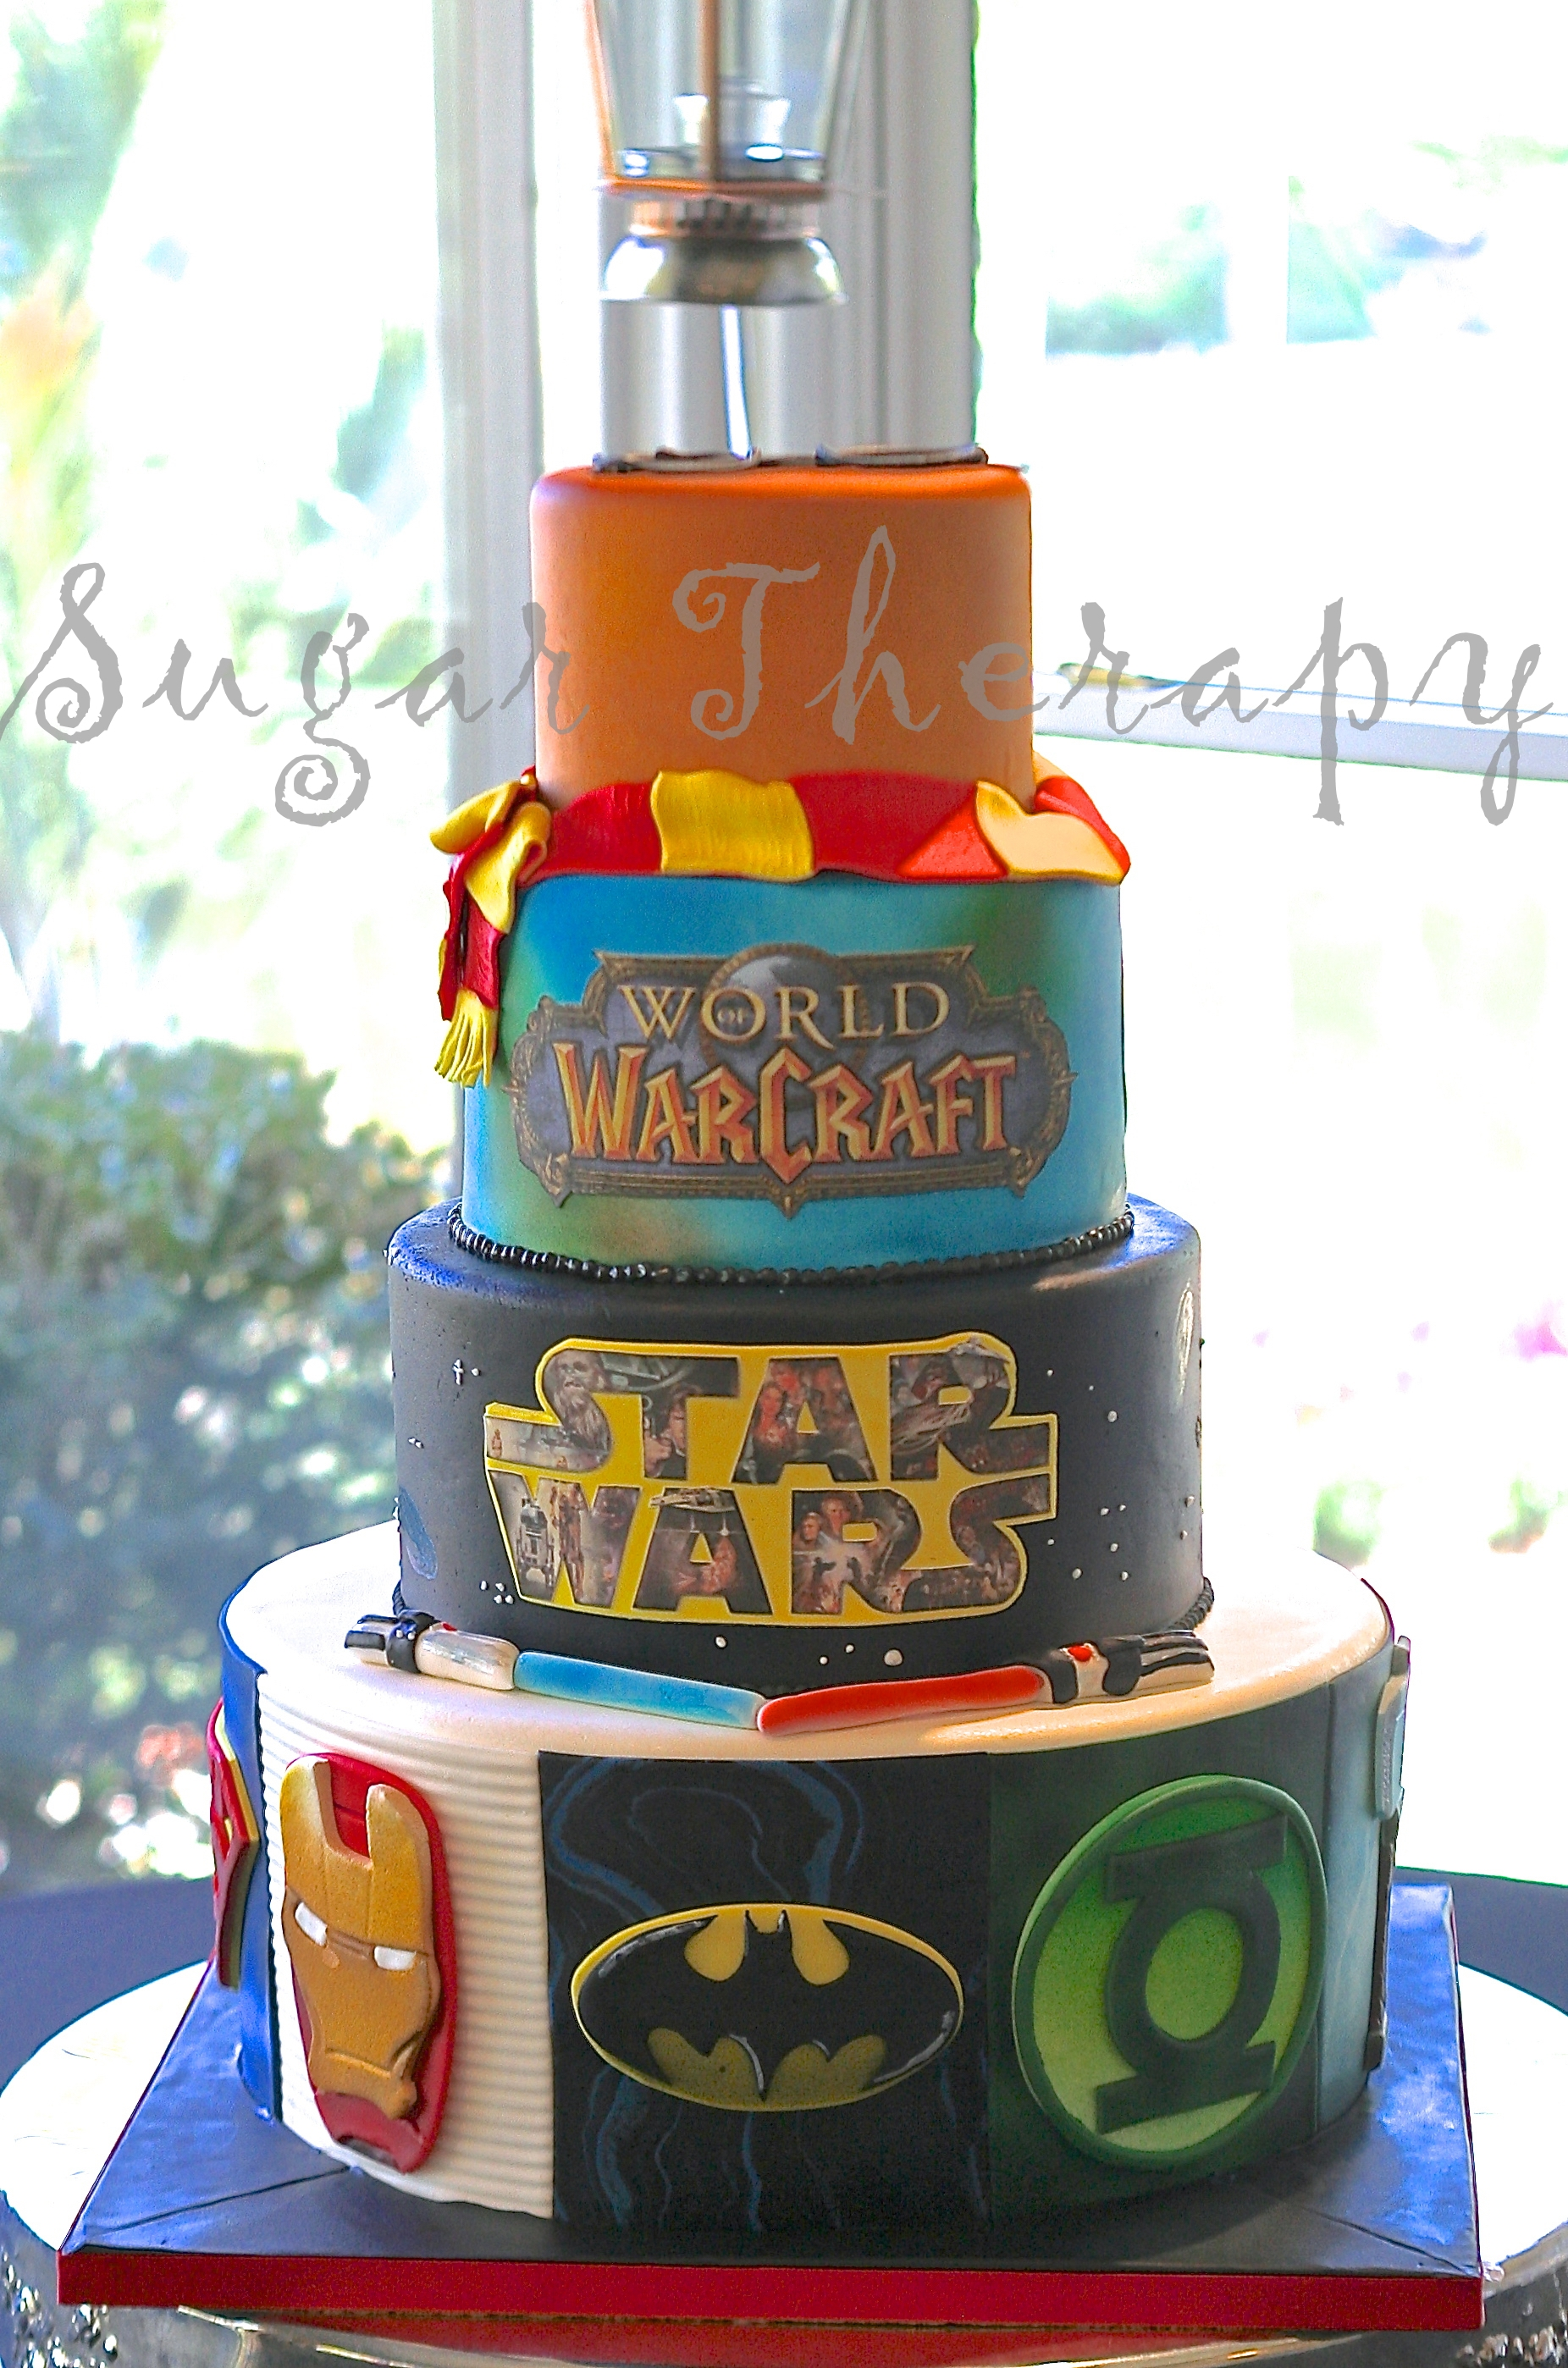 Star Wars World Of Warcraft Harry Potter Comic Book